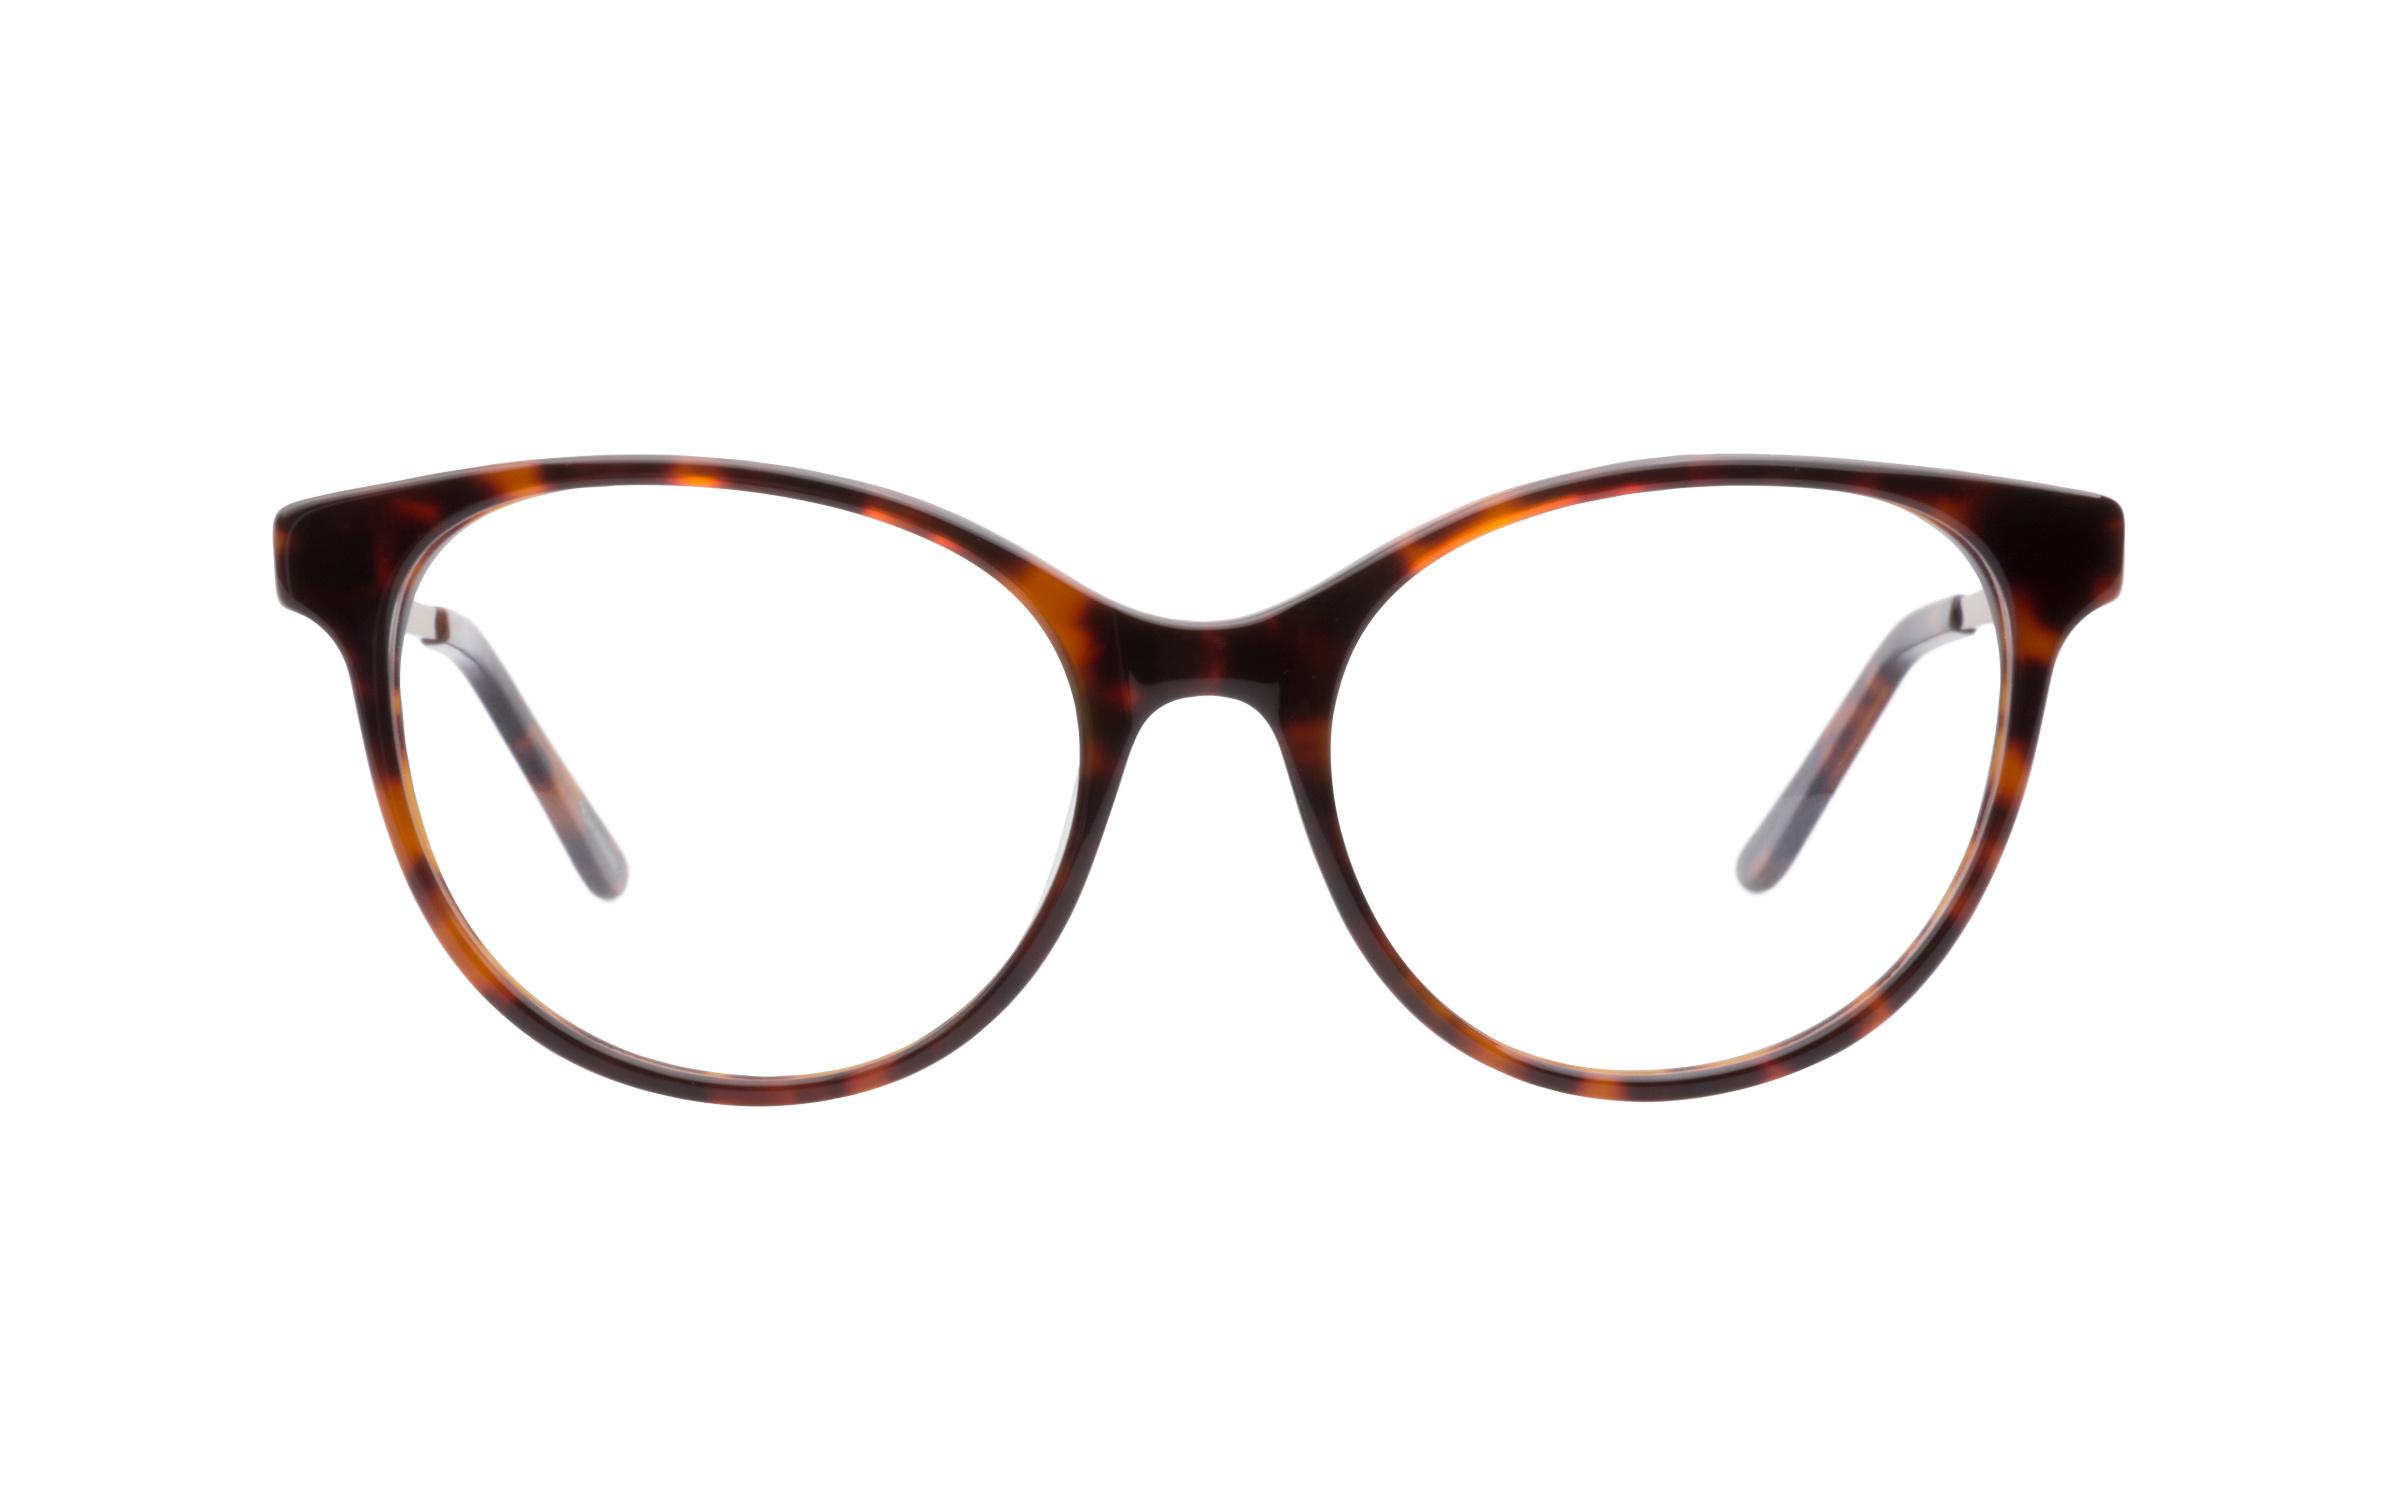 Womens_CatEye_Glasses_Tortoise_Kam_Dhillon_Online_Coastal